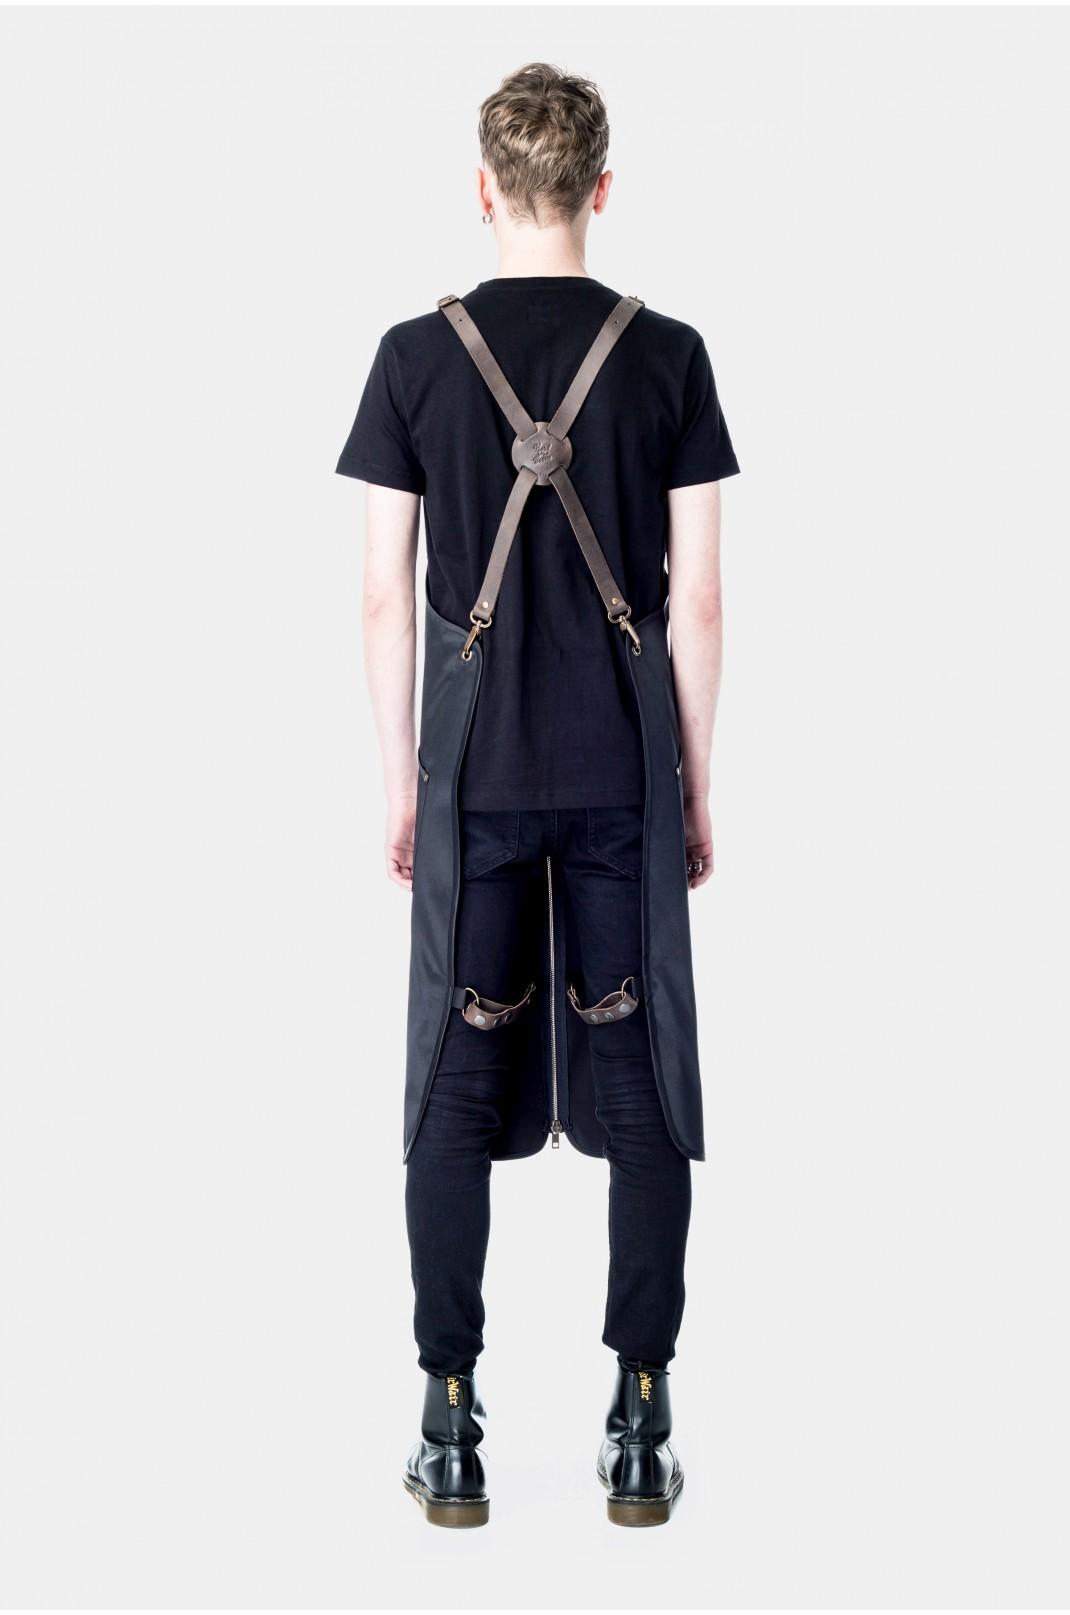 Black Zipper Leather Braces